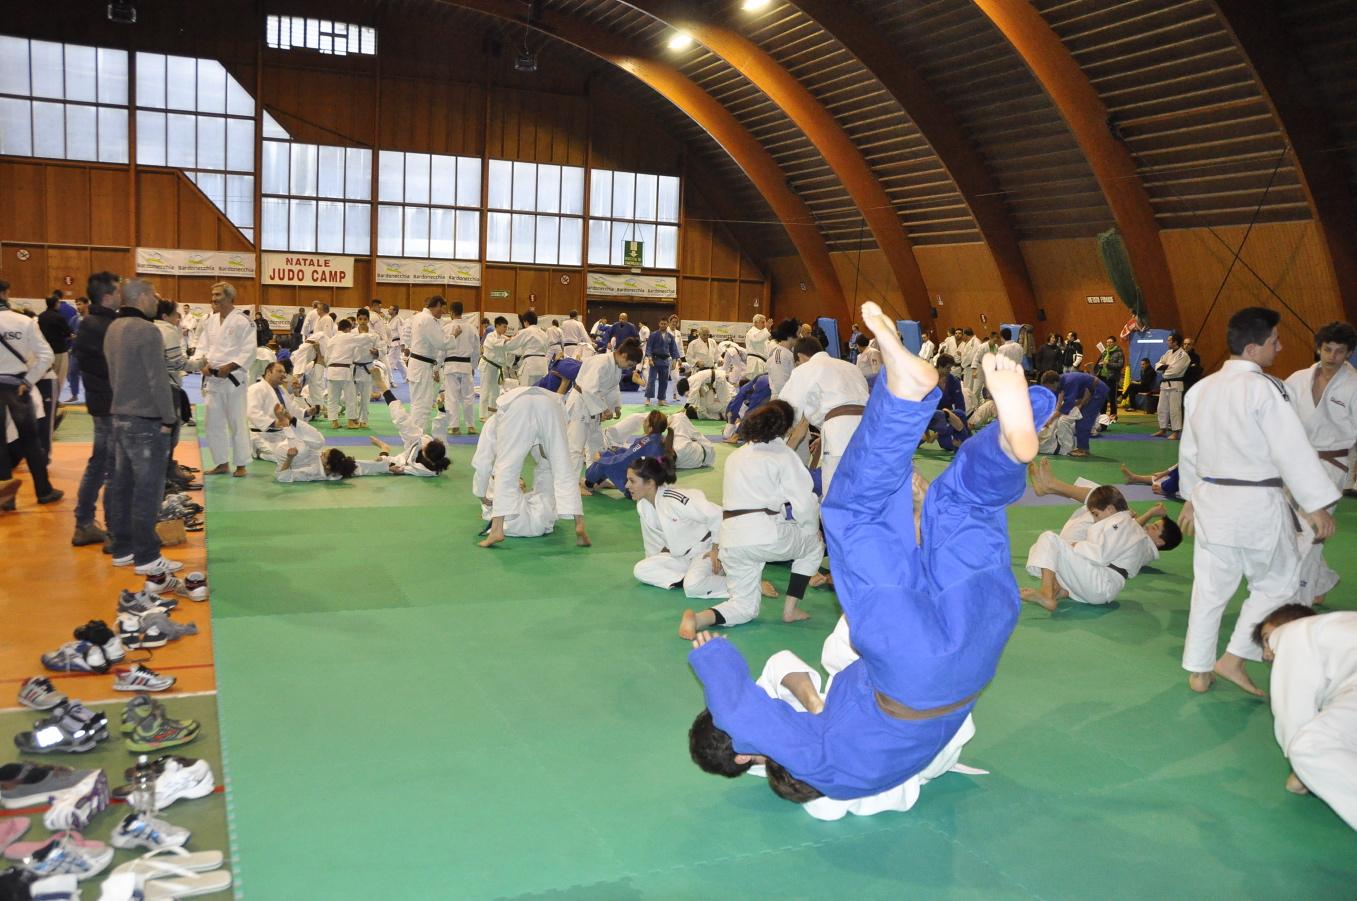 Natale Judo Camp 2019